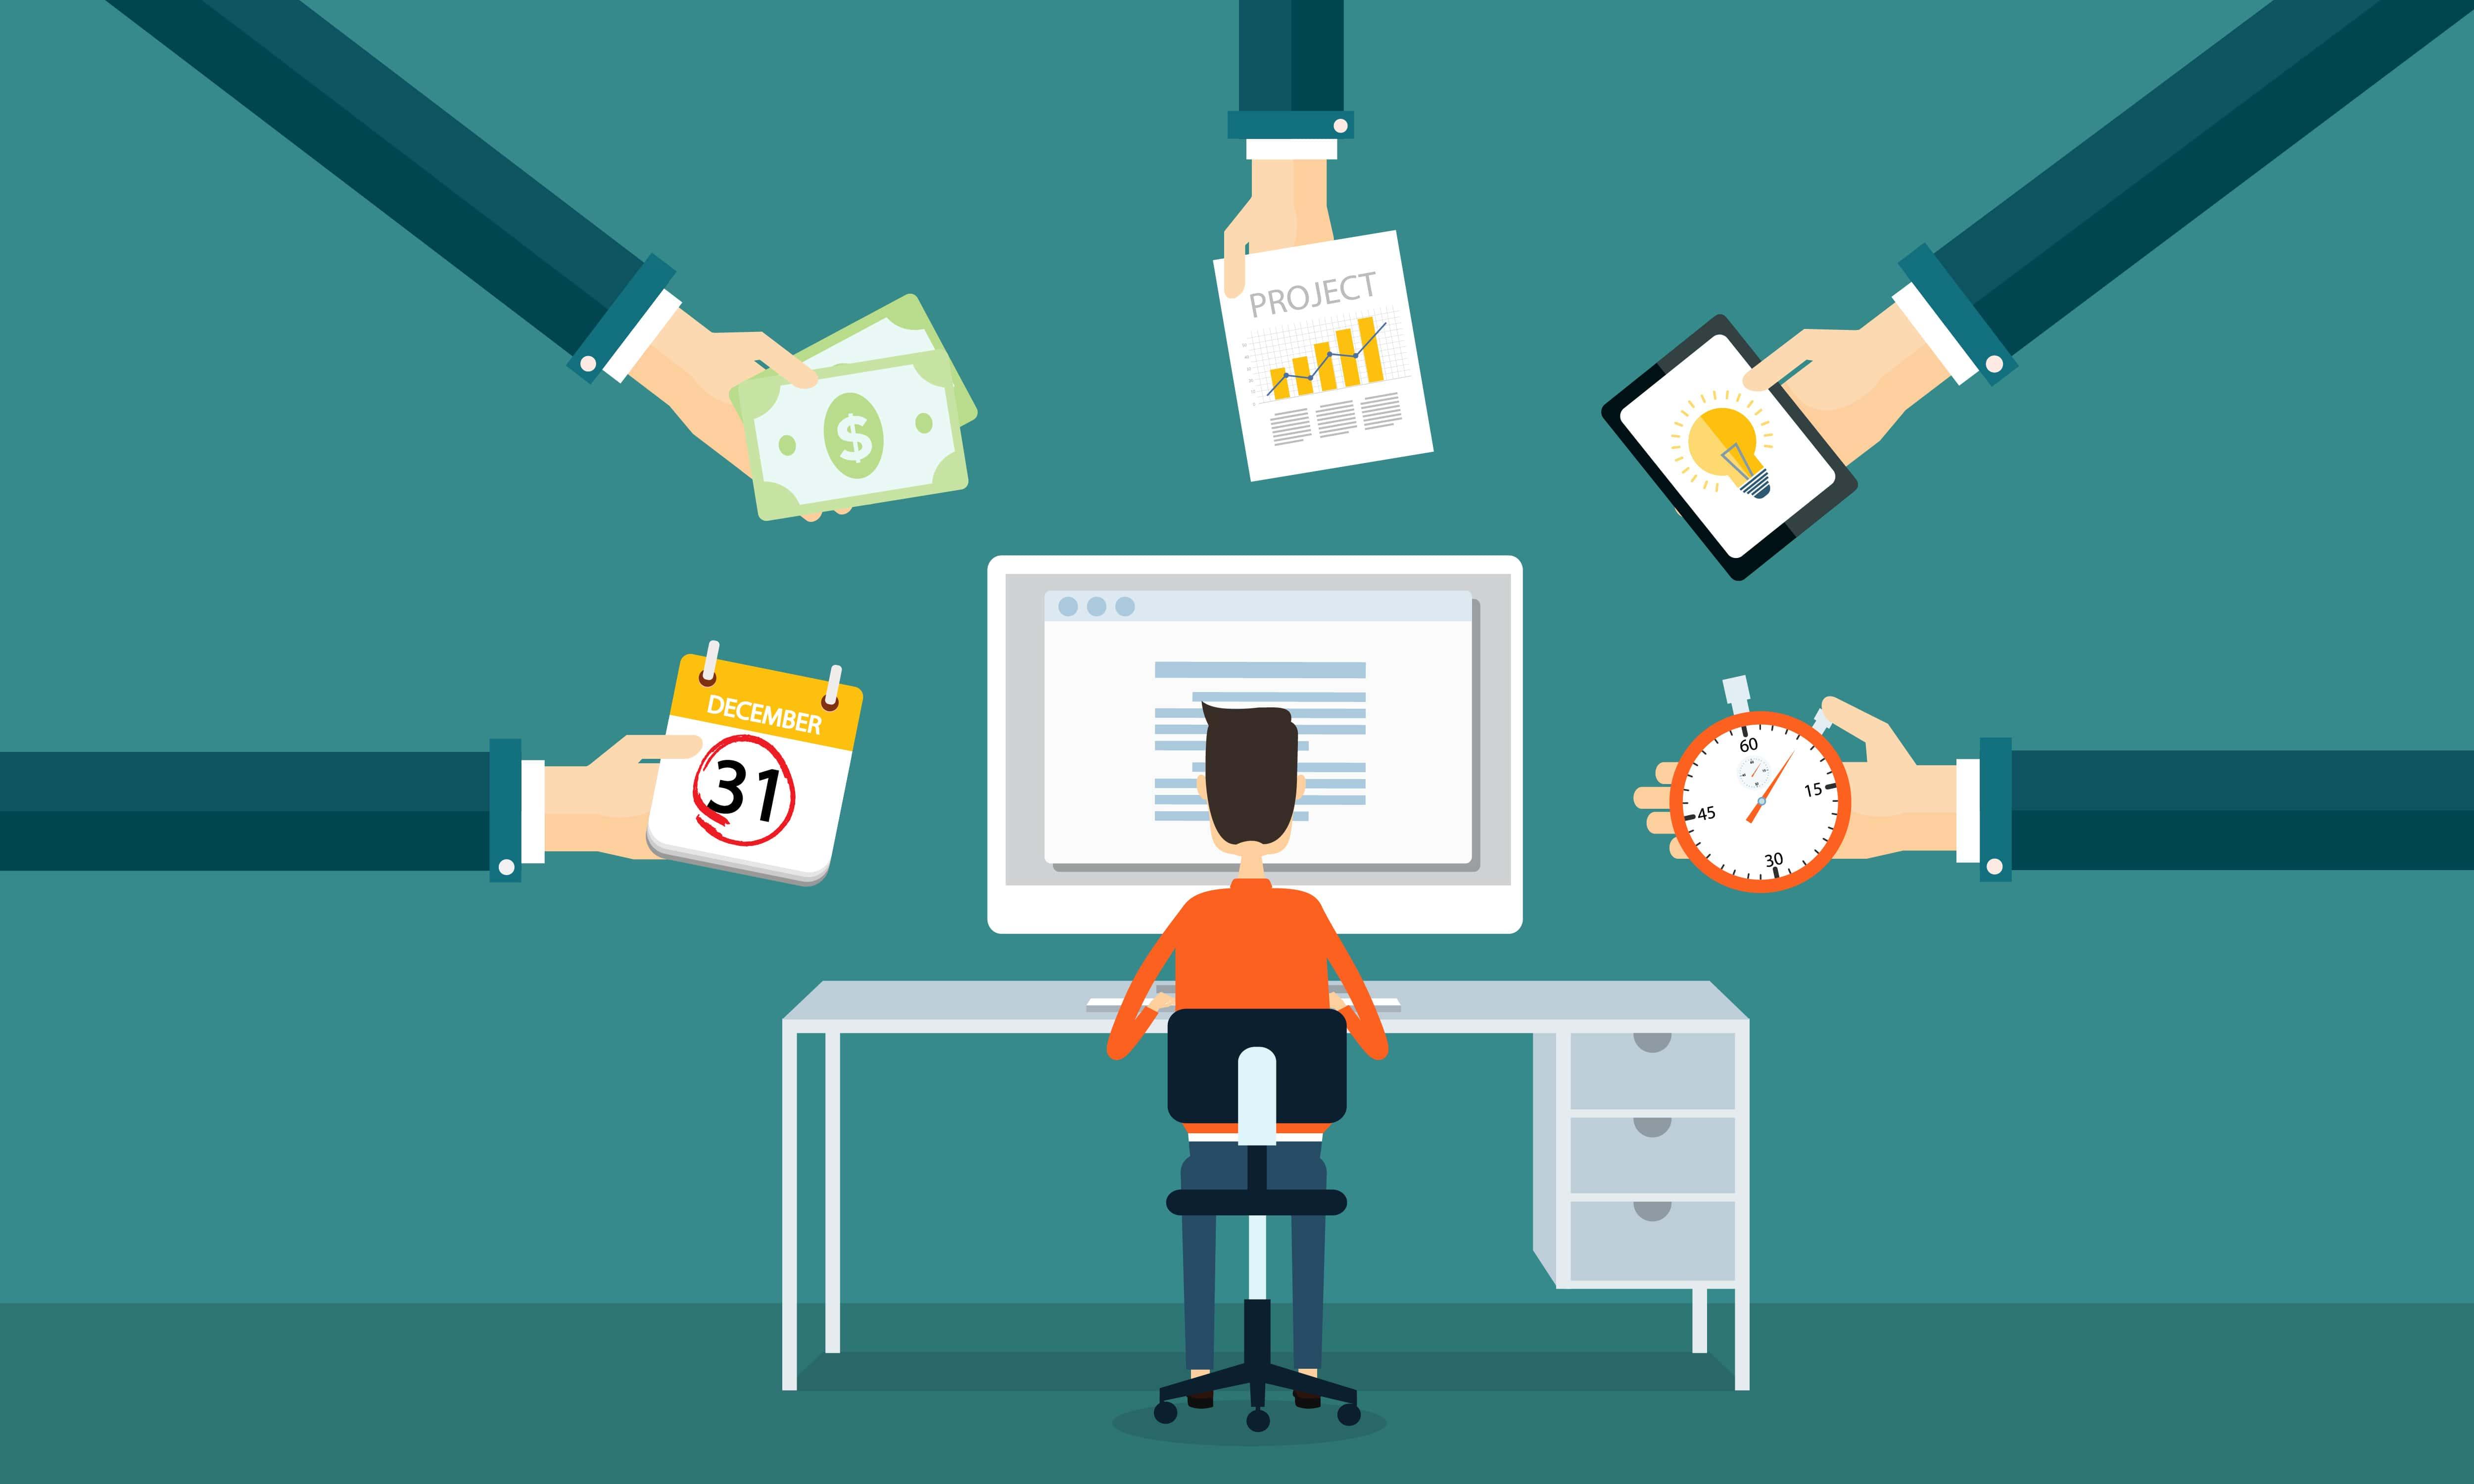 Freelancer mistake-to work